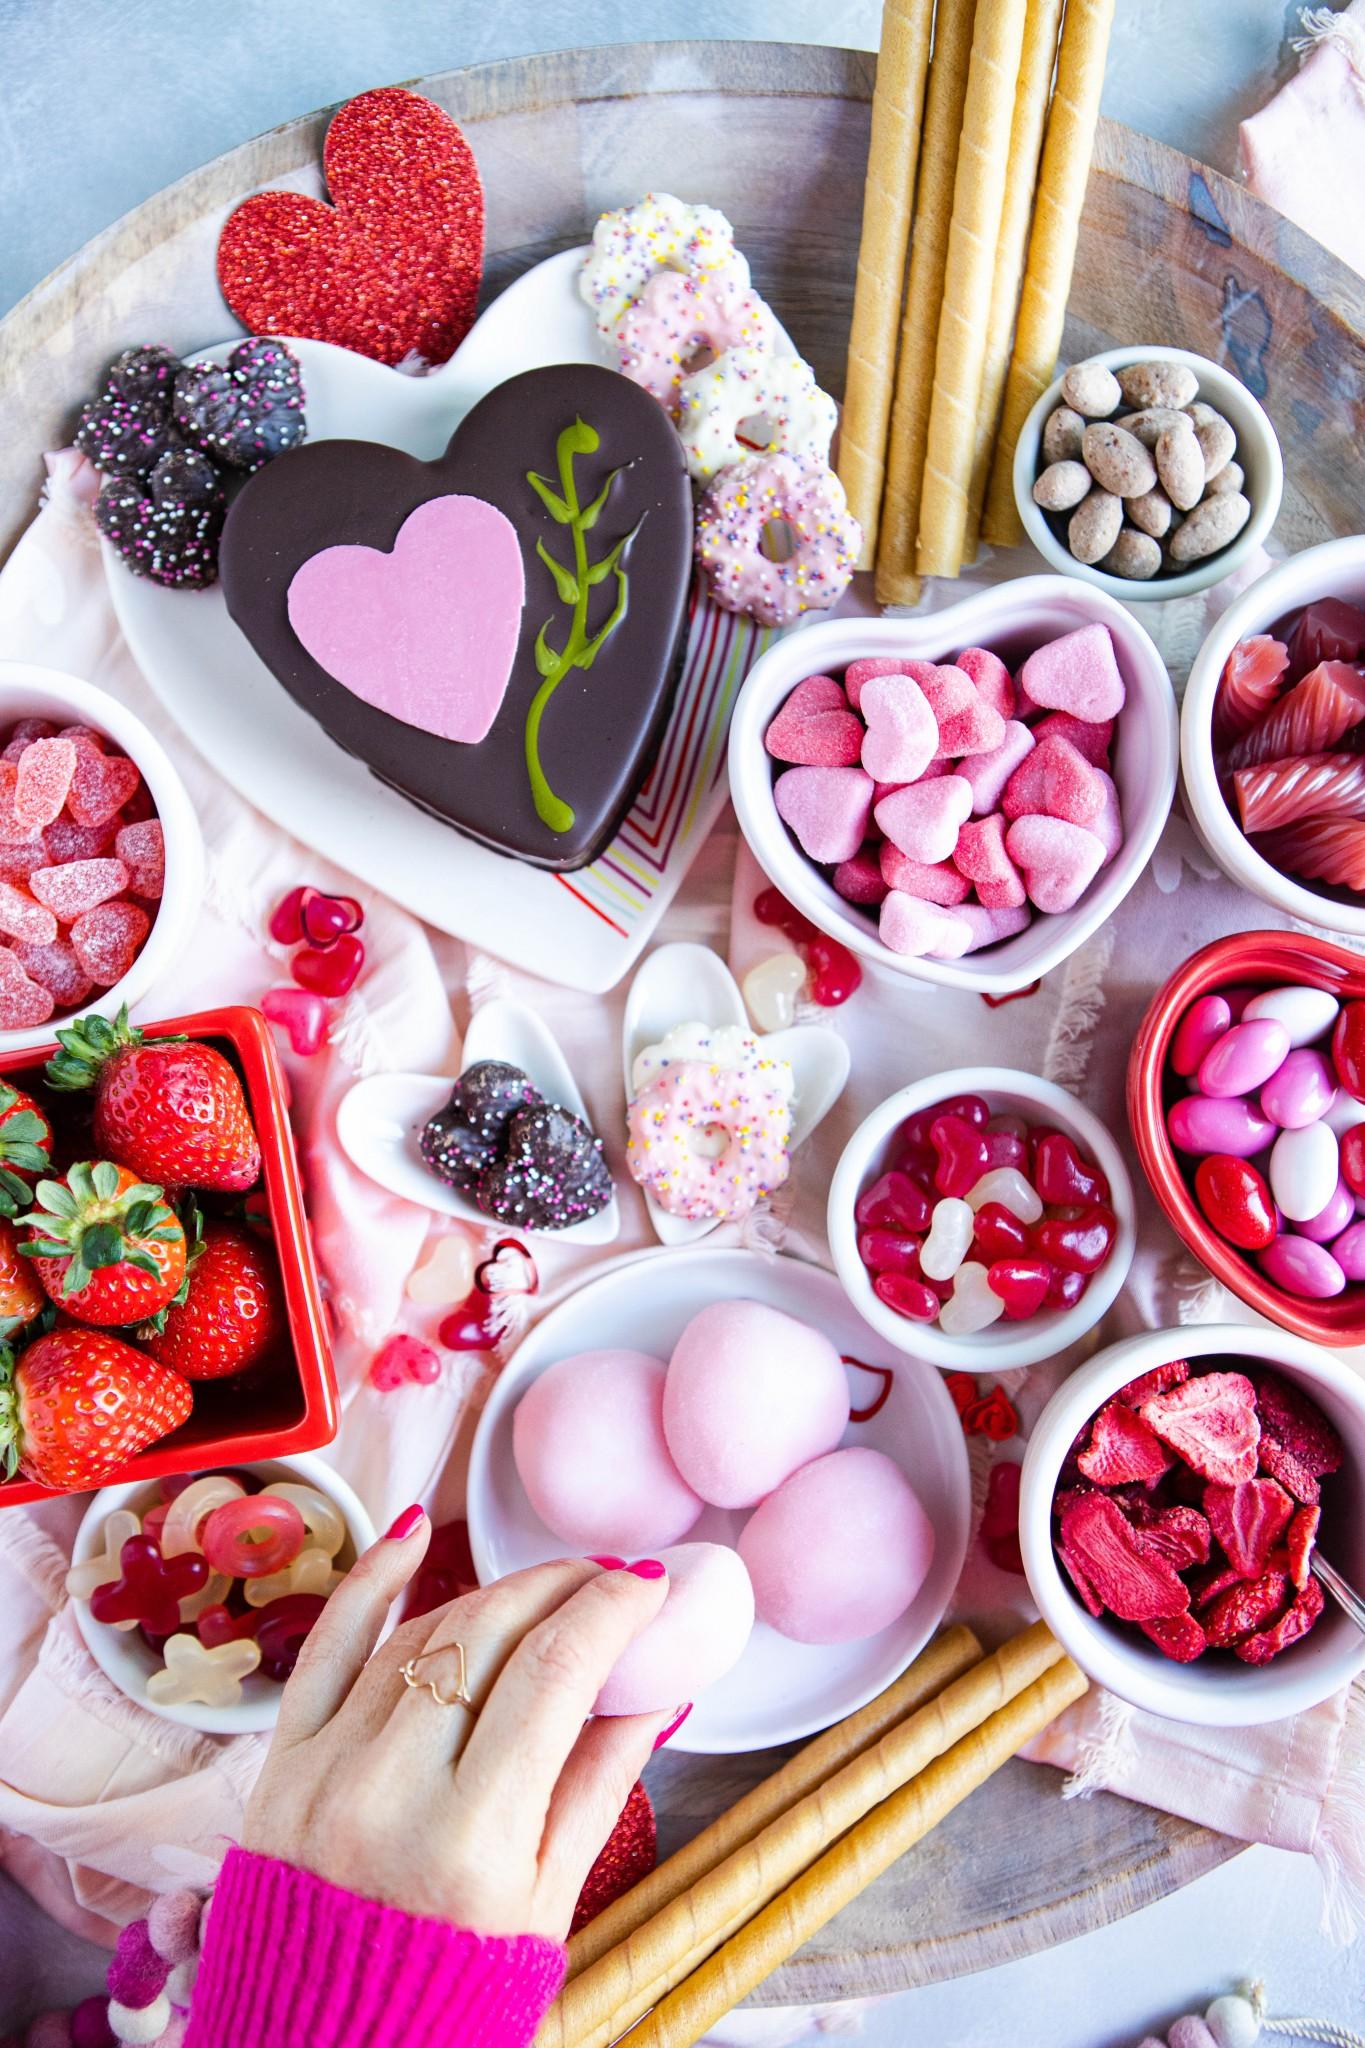 dessert charcuterie board set for Valentine's Day